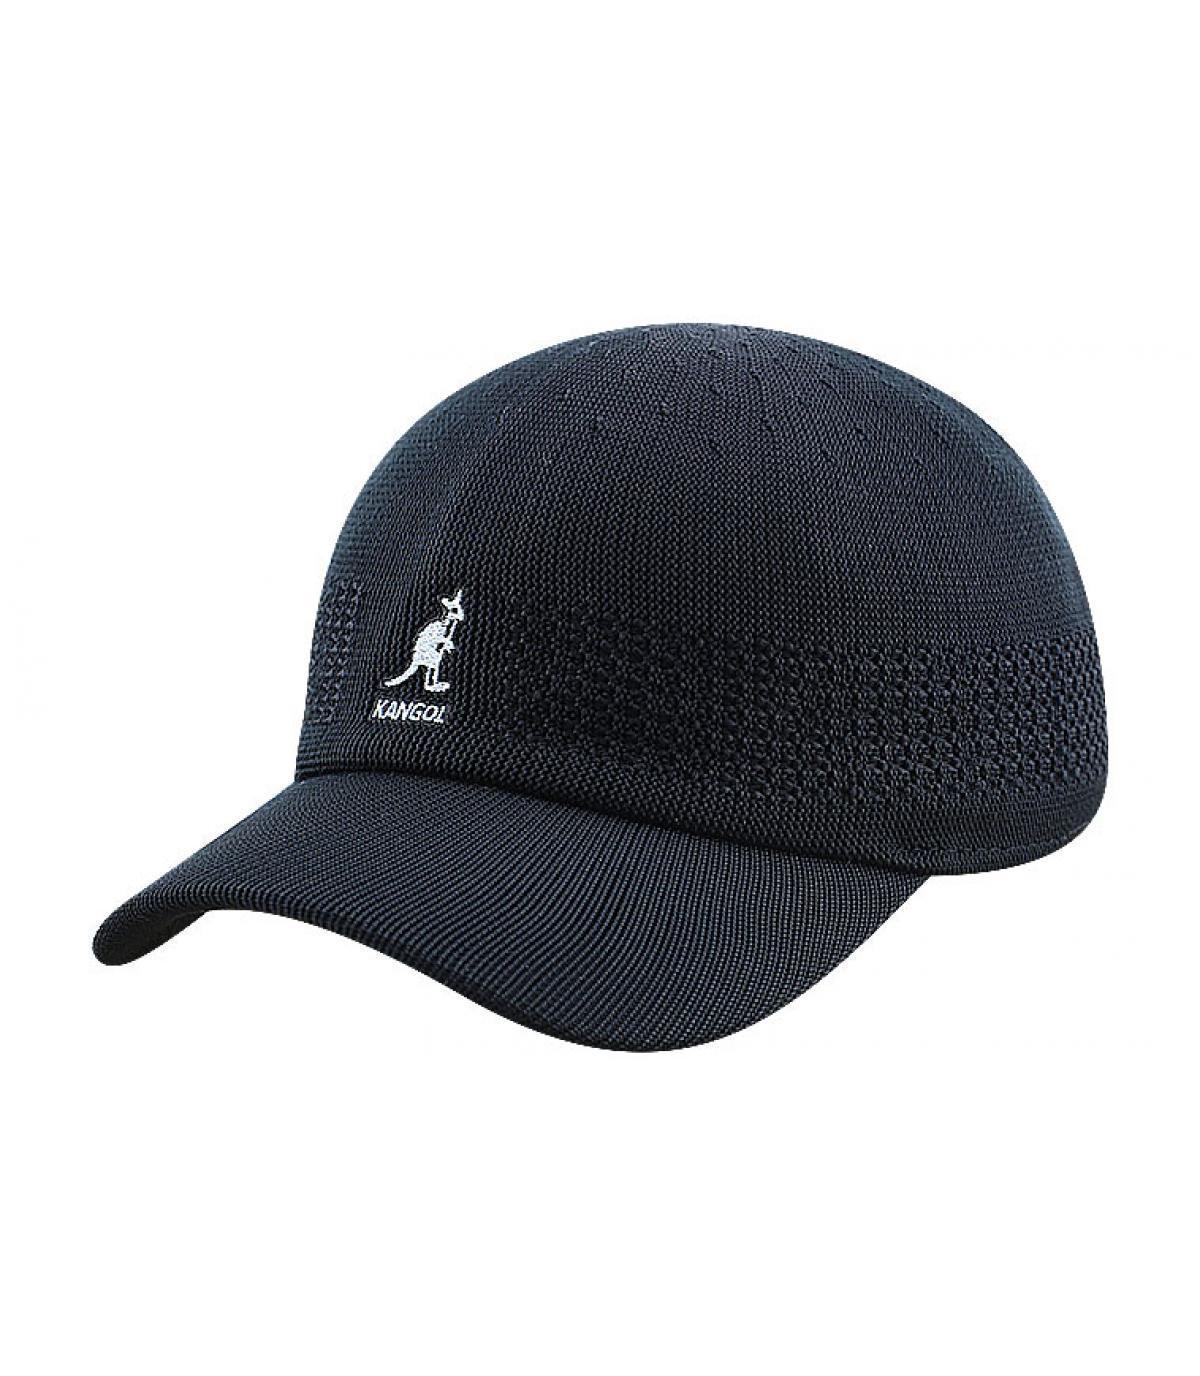 Kangol black trucker cap